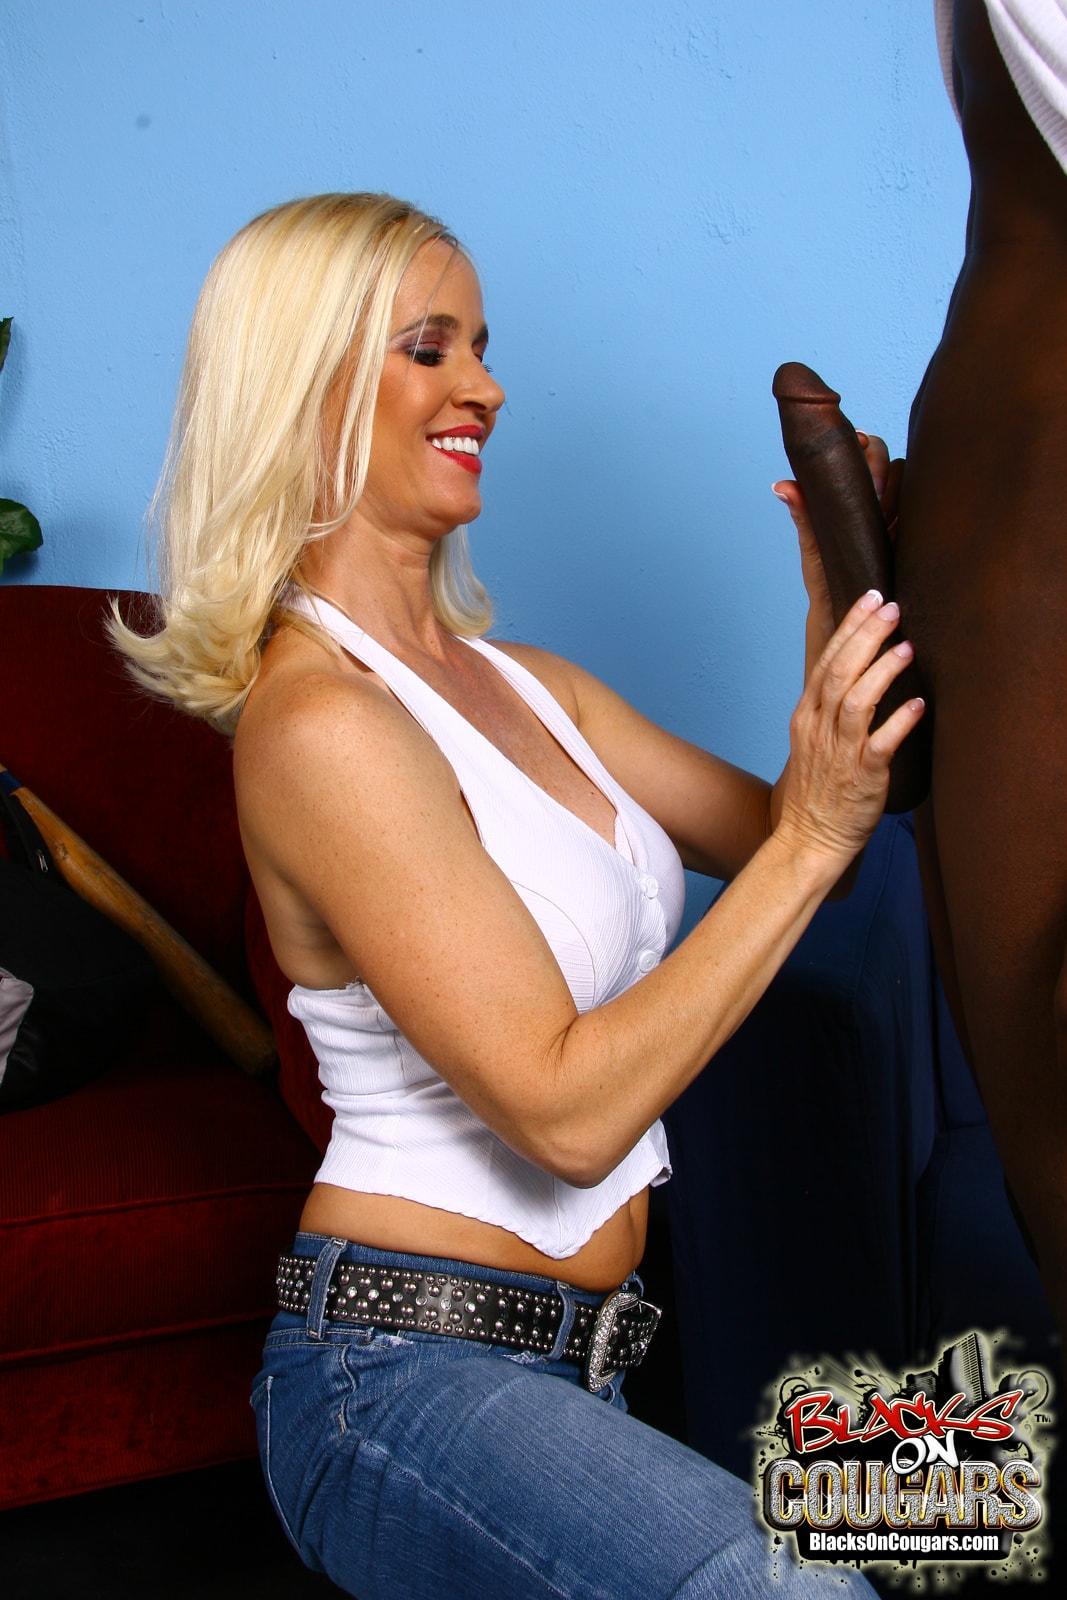 Dogfart '- Blacks On Cougars' starring Tabitha (Photo 9)